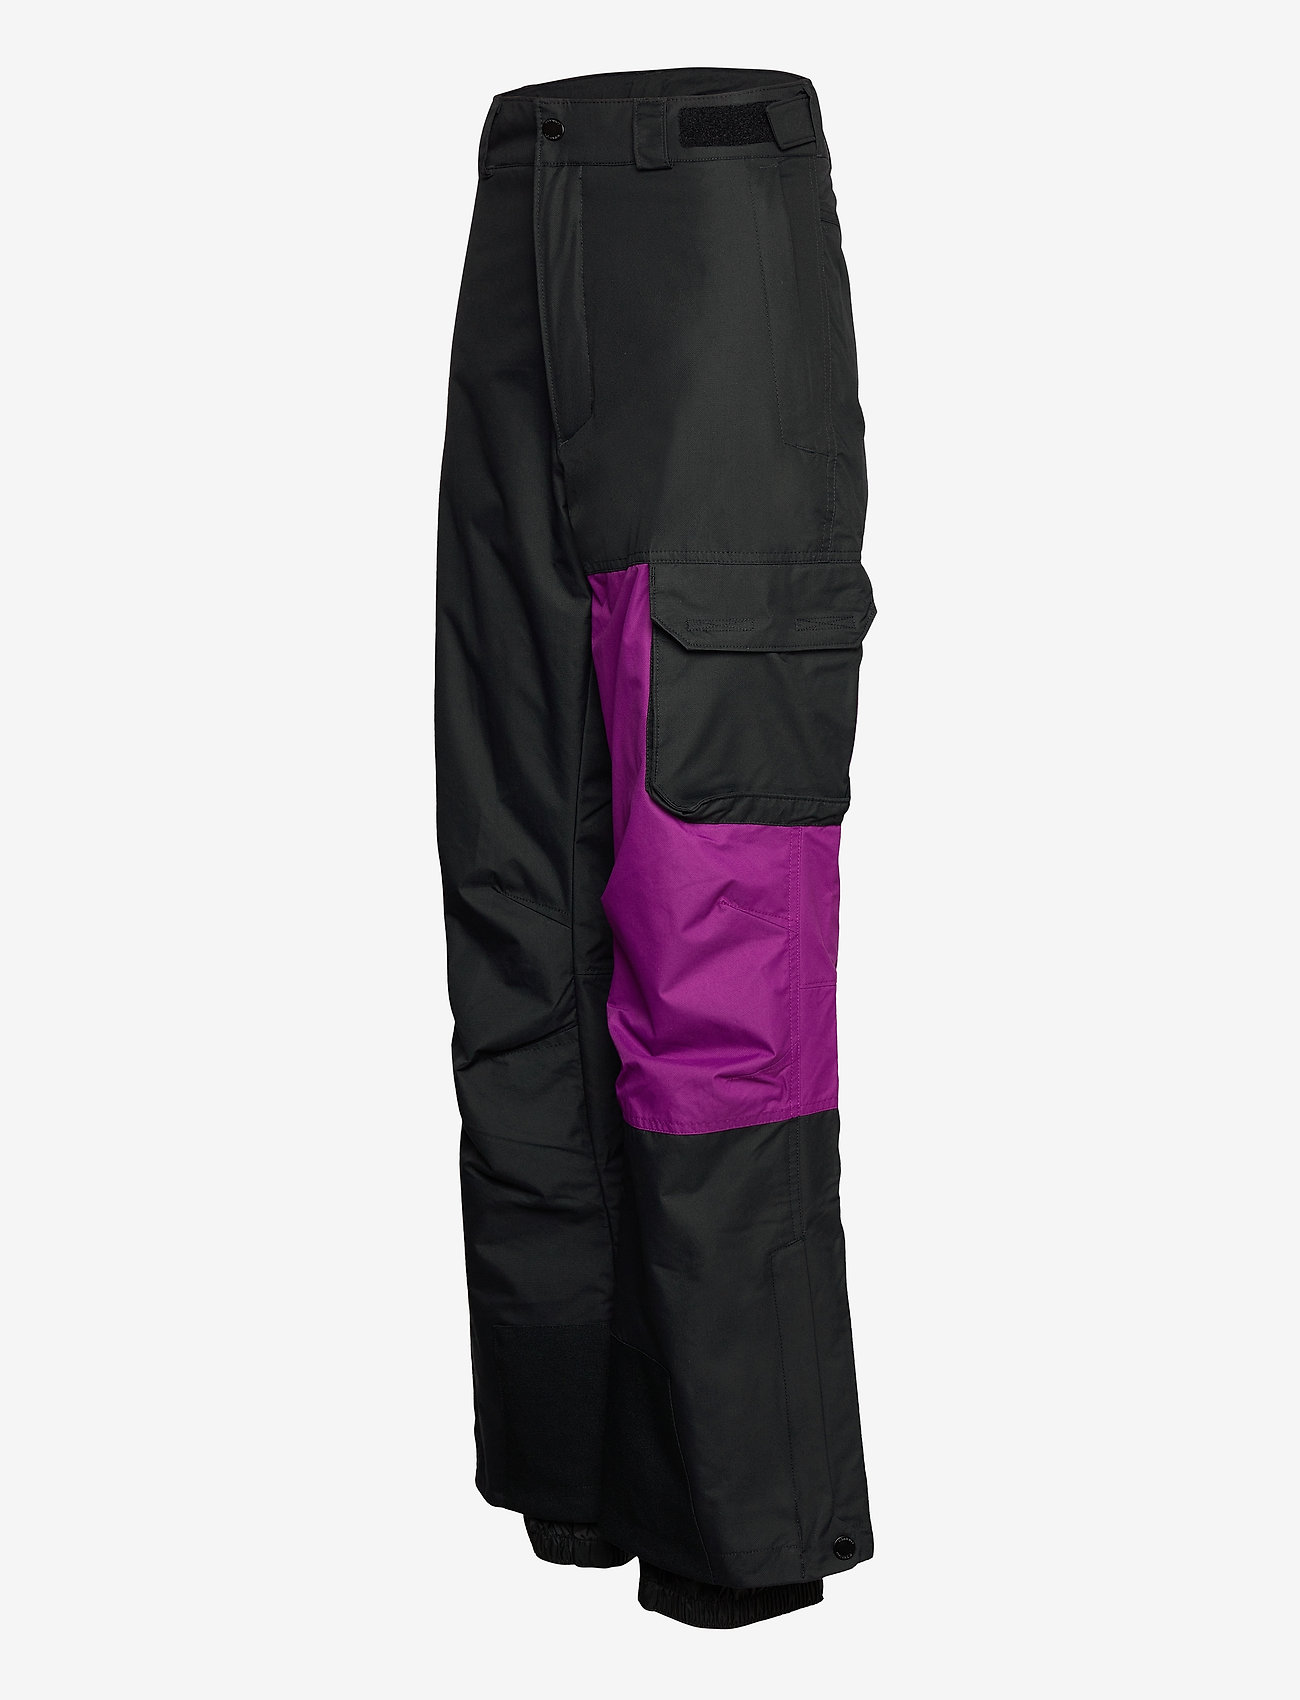 Columbia - Hero Snow™ Pant - spodnie narciarskie - black, plum - 1